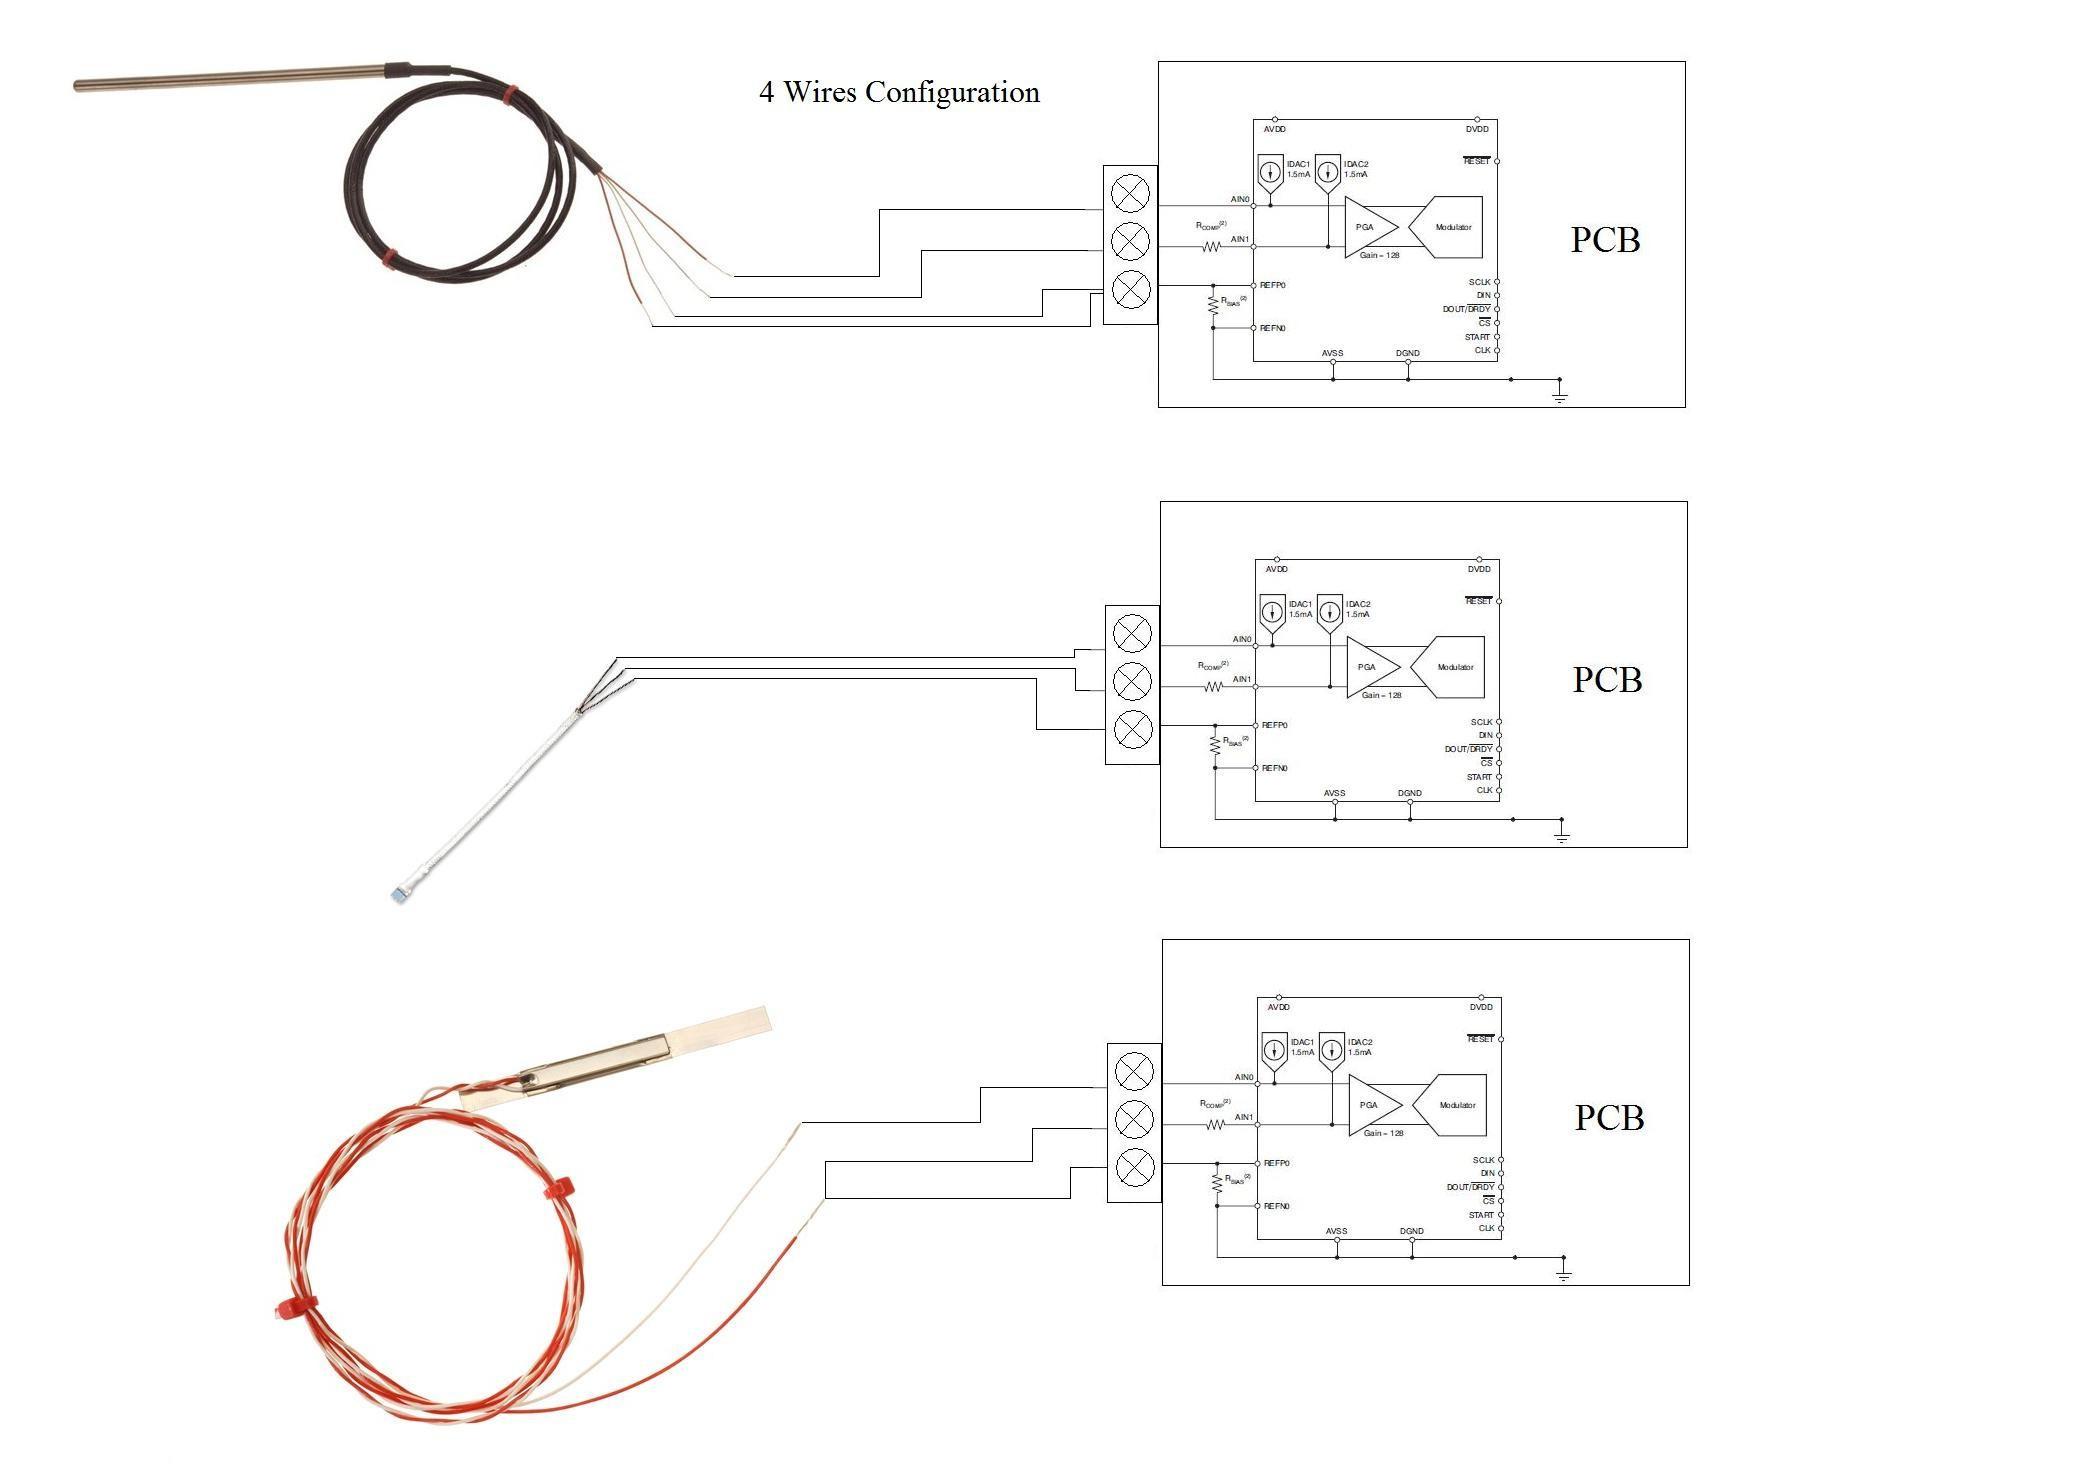 4 Wire Rtd Wiring Diagram 4 Wire Rtd Wiring Diagram Best 3 Wire Rtd Wiring Diagram Sample Pdf Of 4 Wire Rtd Wiring Diagram